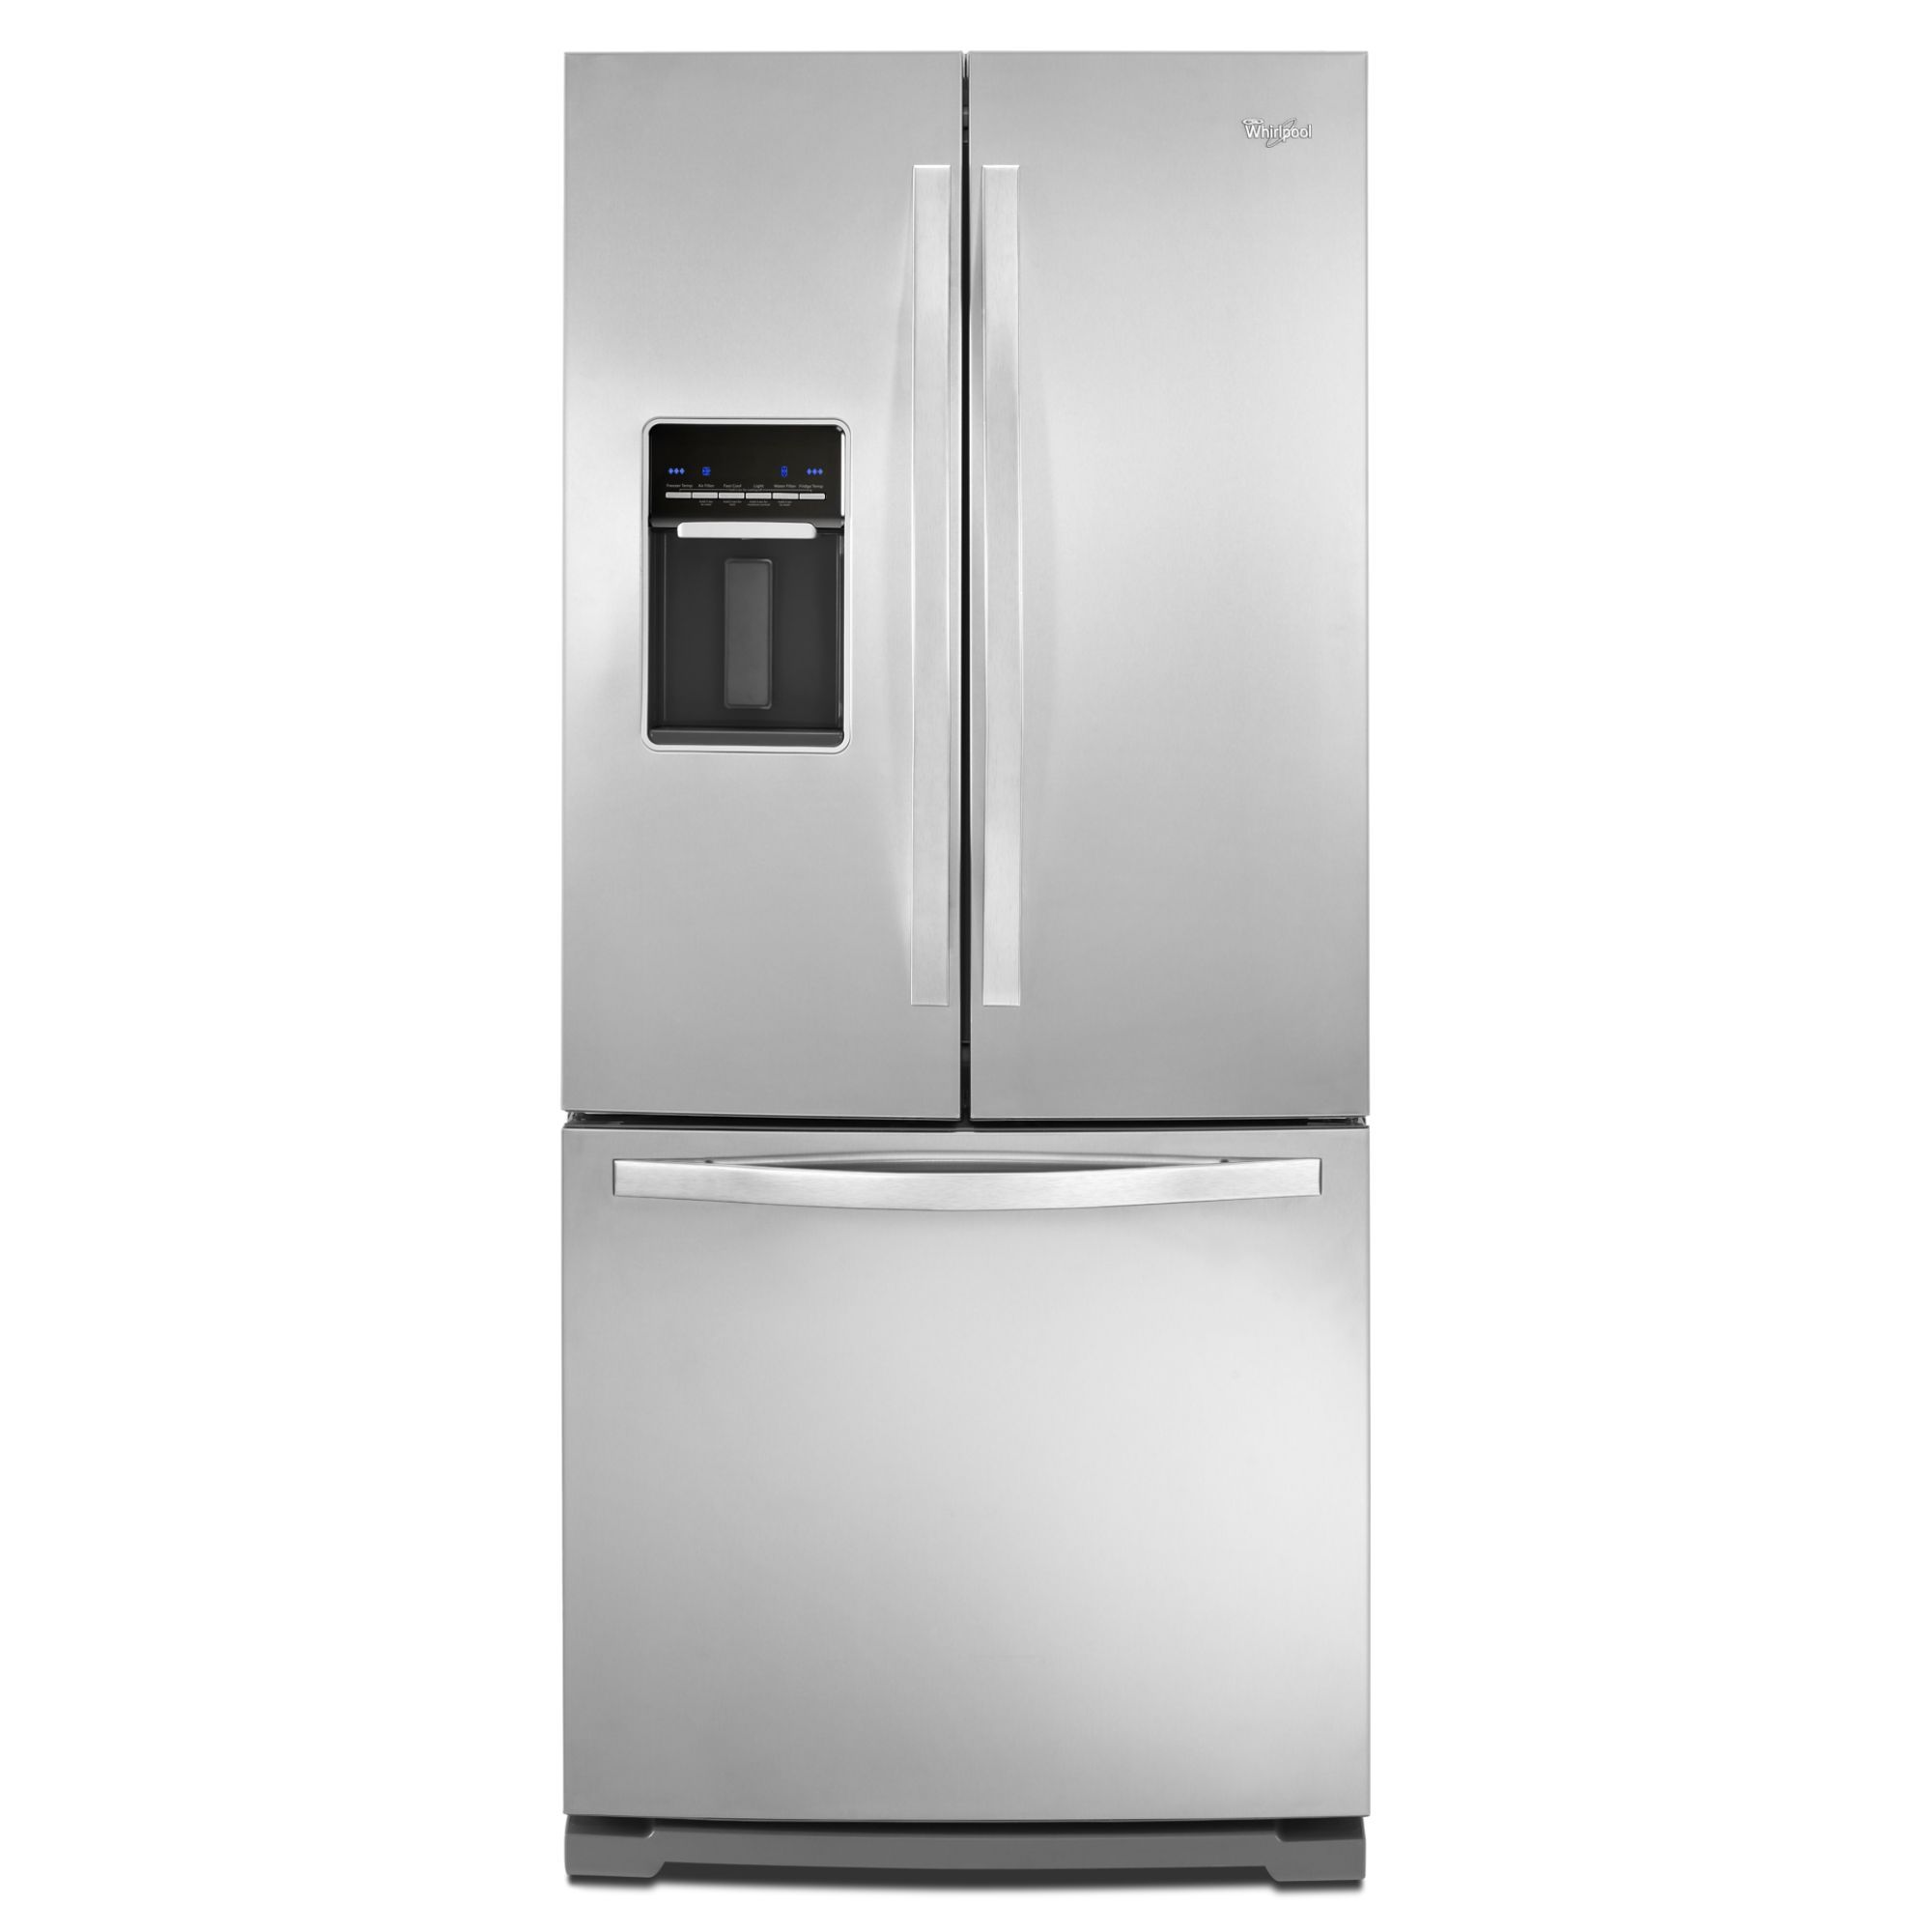 71323 218 Cu Ft French Door Bottom Freezer Refrigeratorstainless